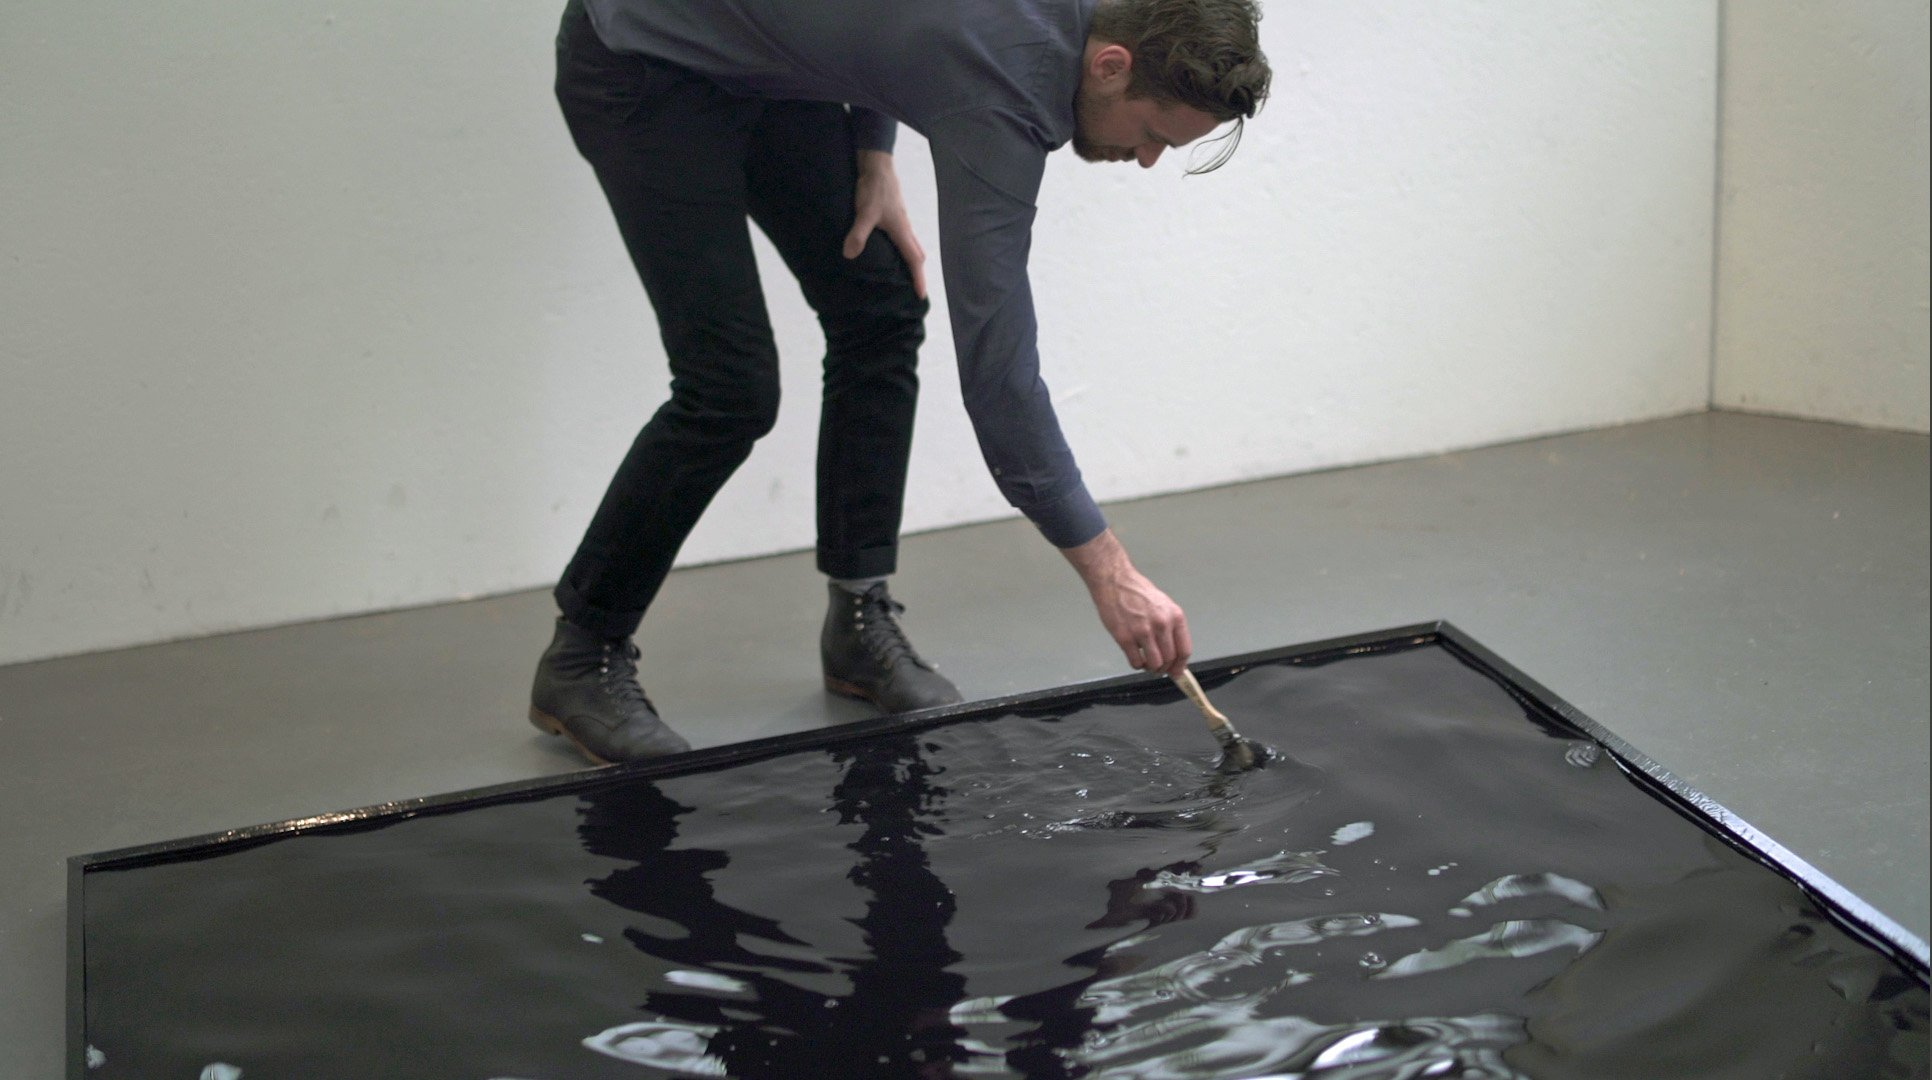 Masterwork-Series_Adam-Lupton_Sugarlift